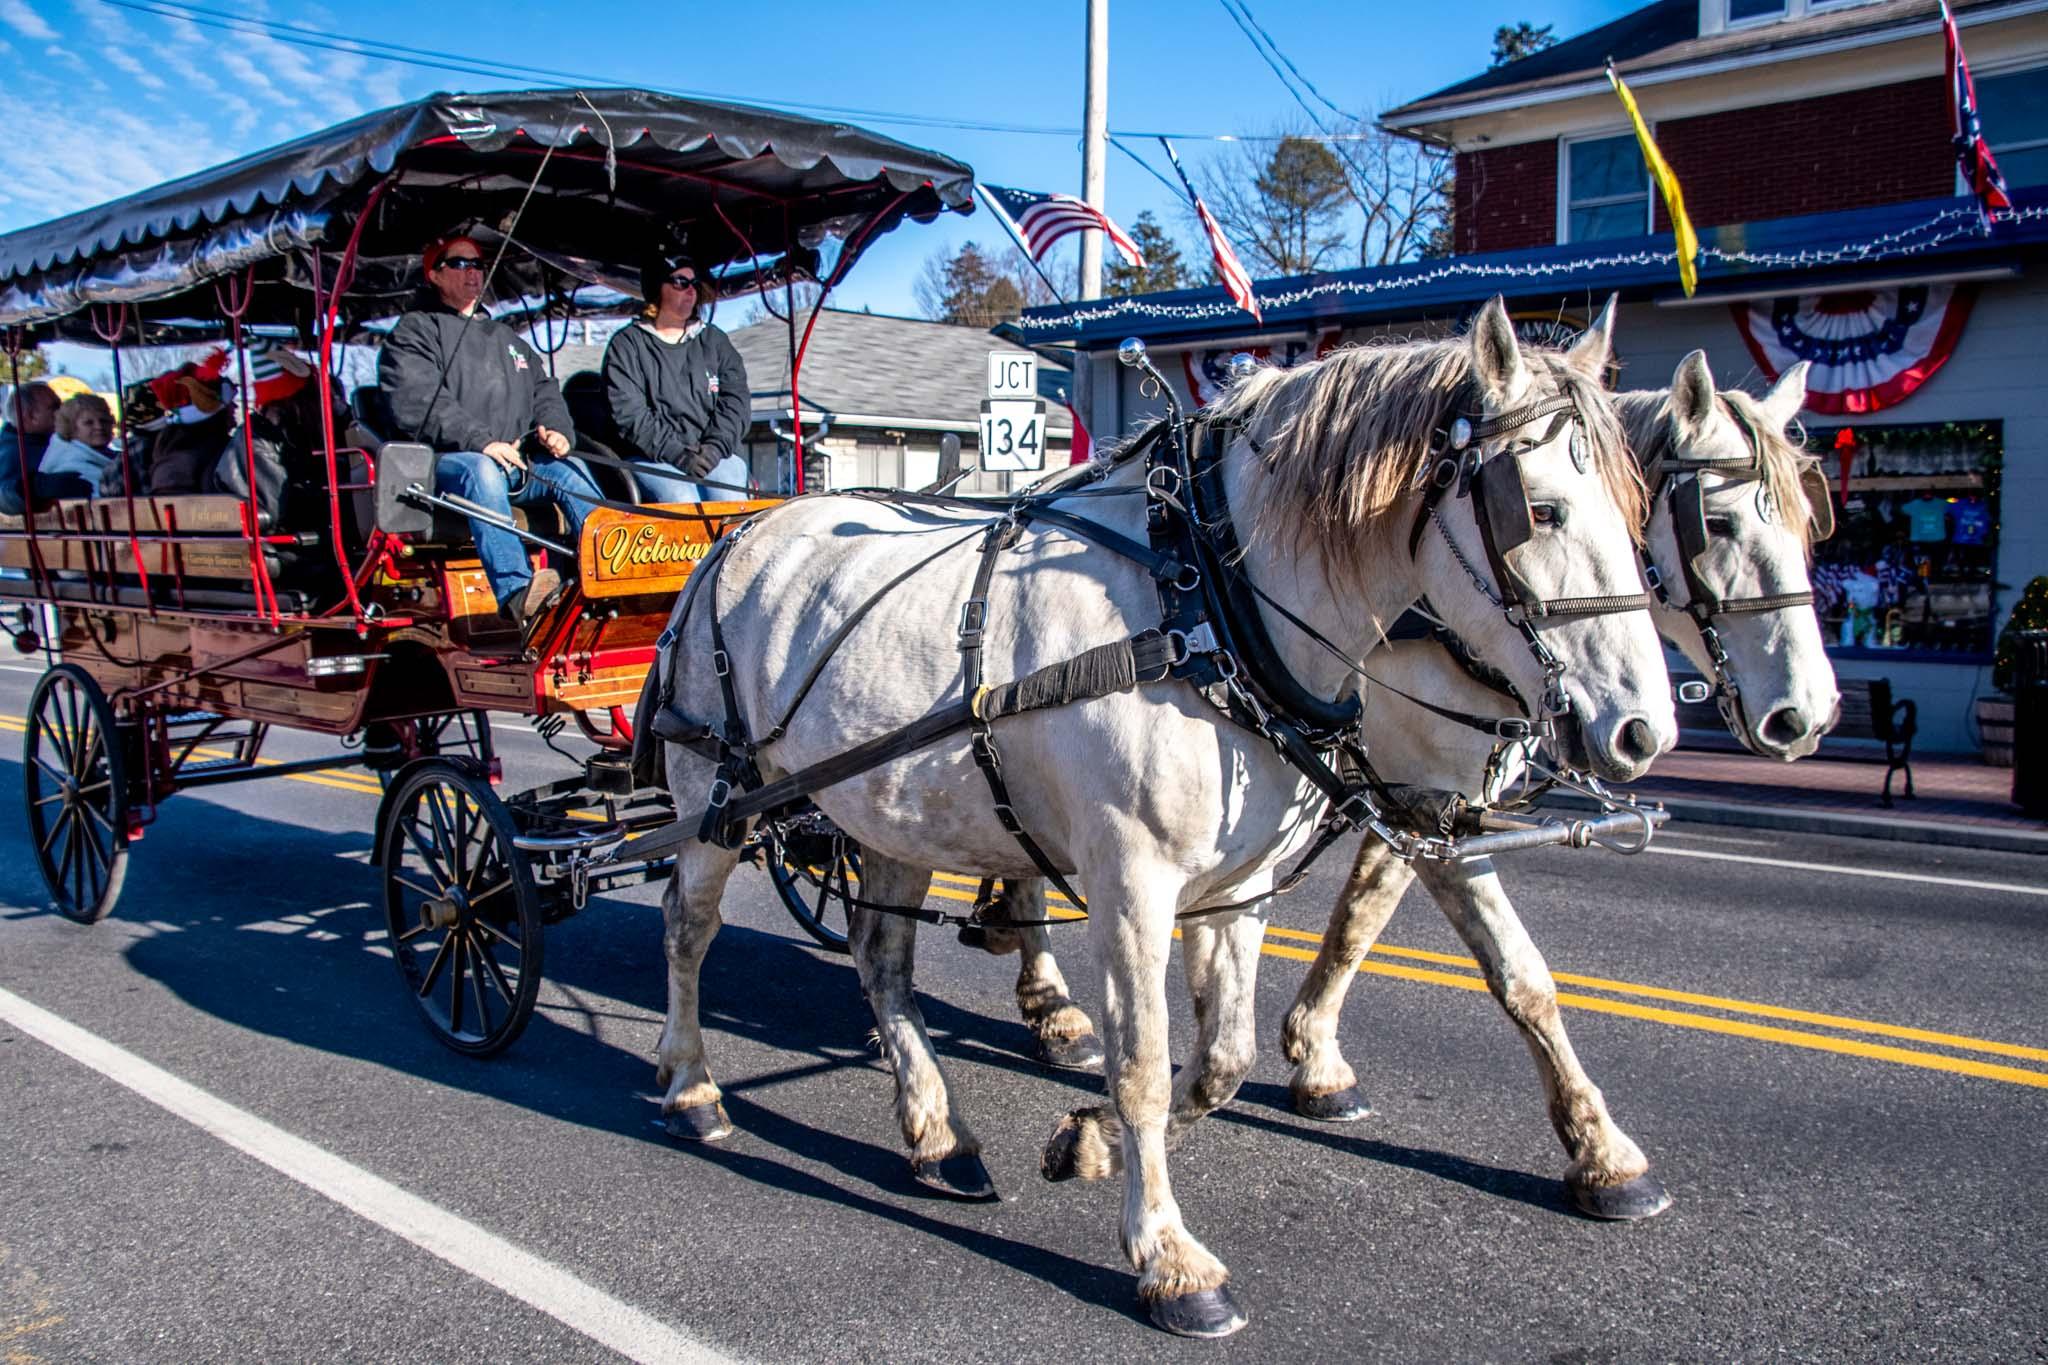 Horse-drawn carriage walking down a street